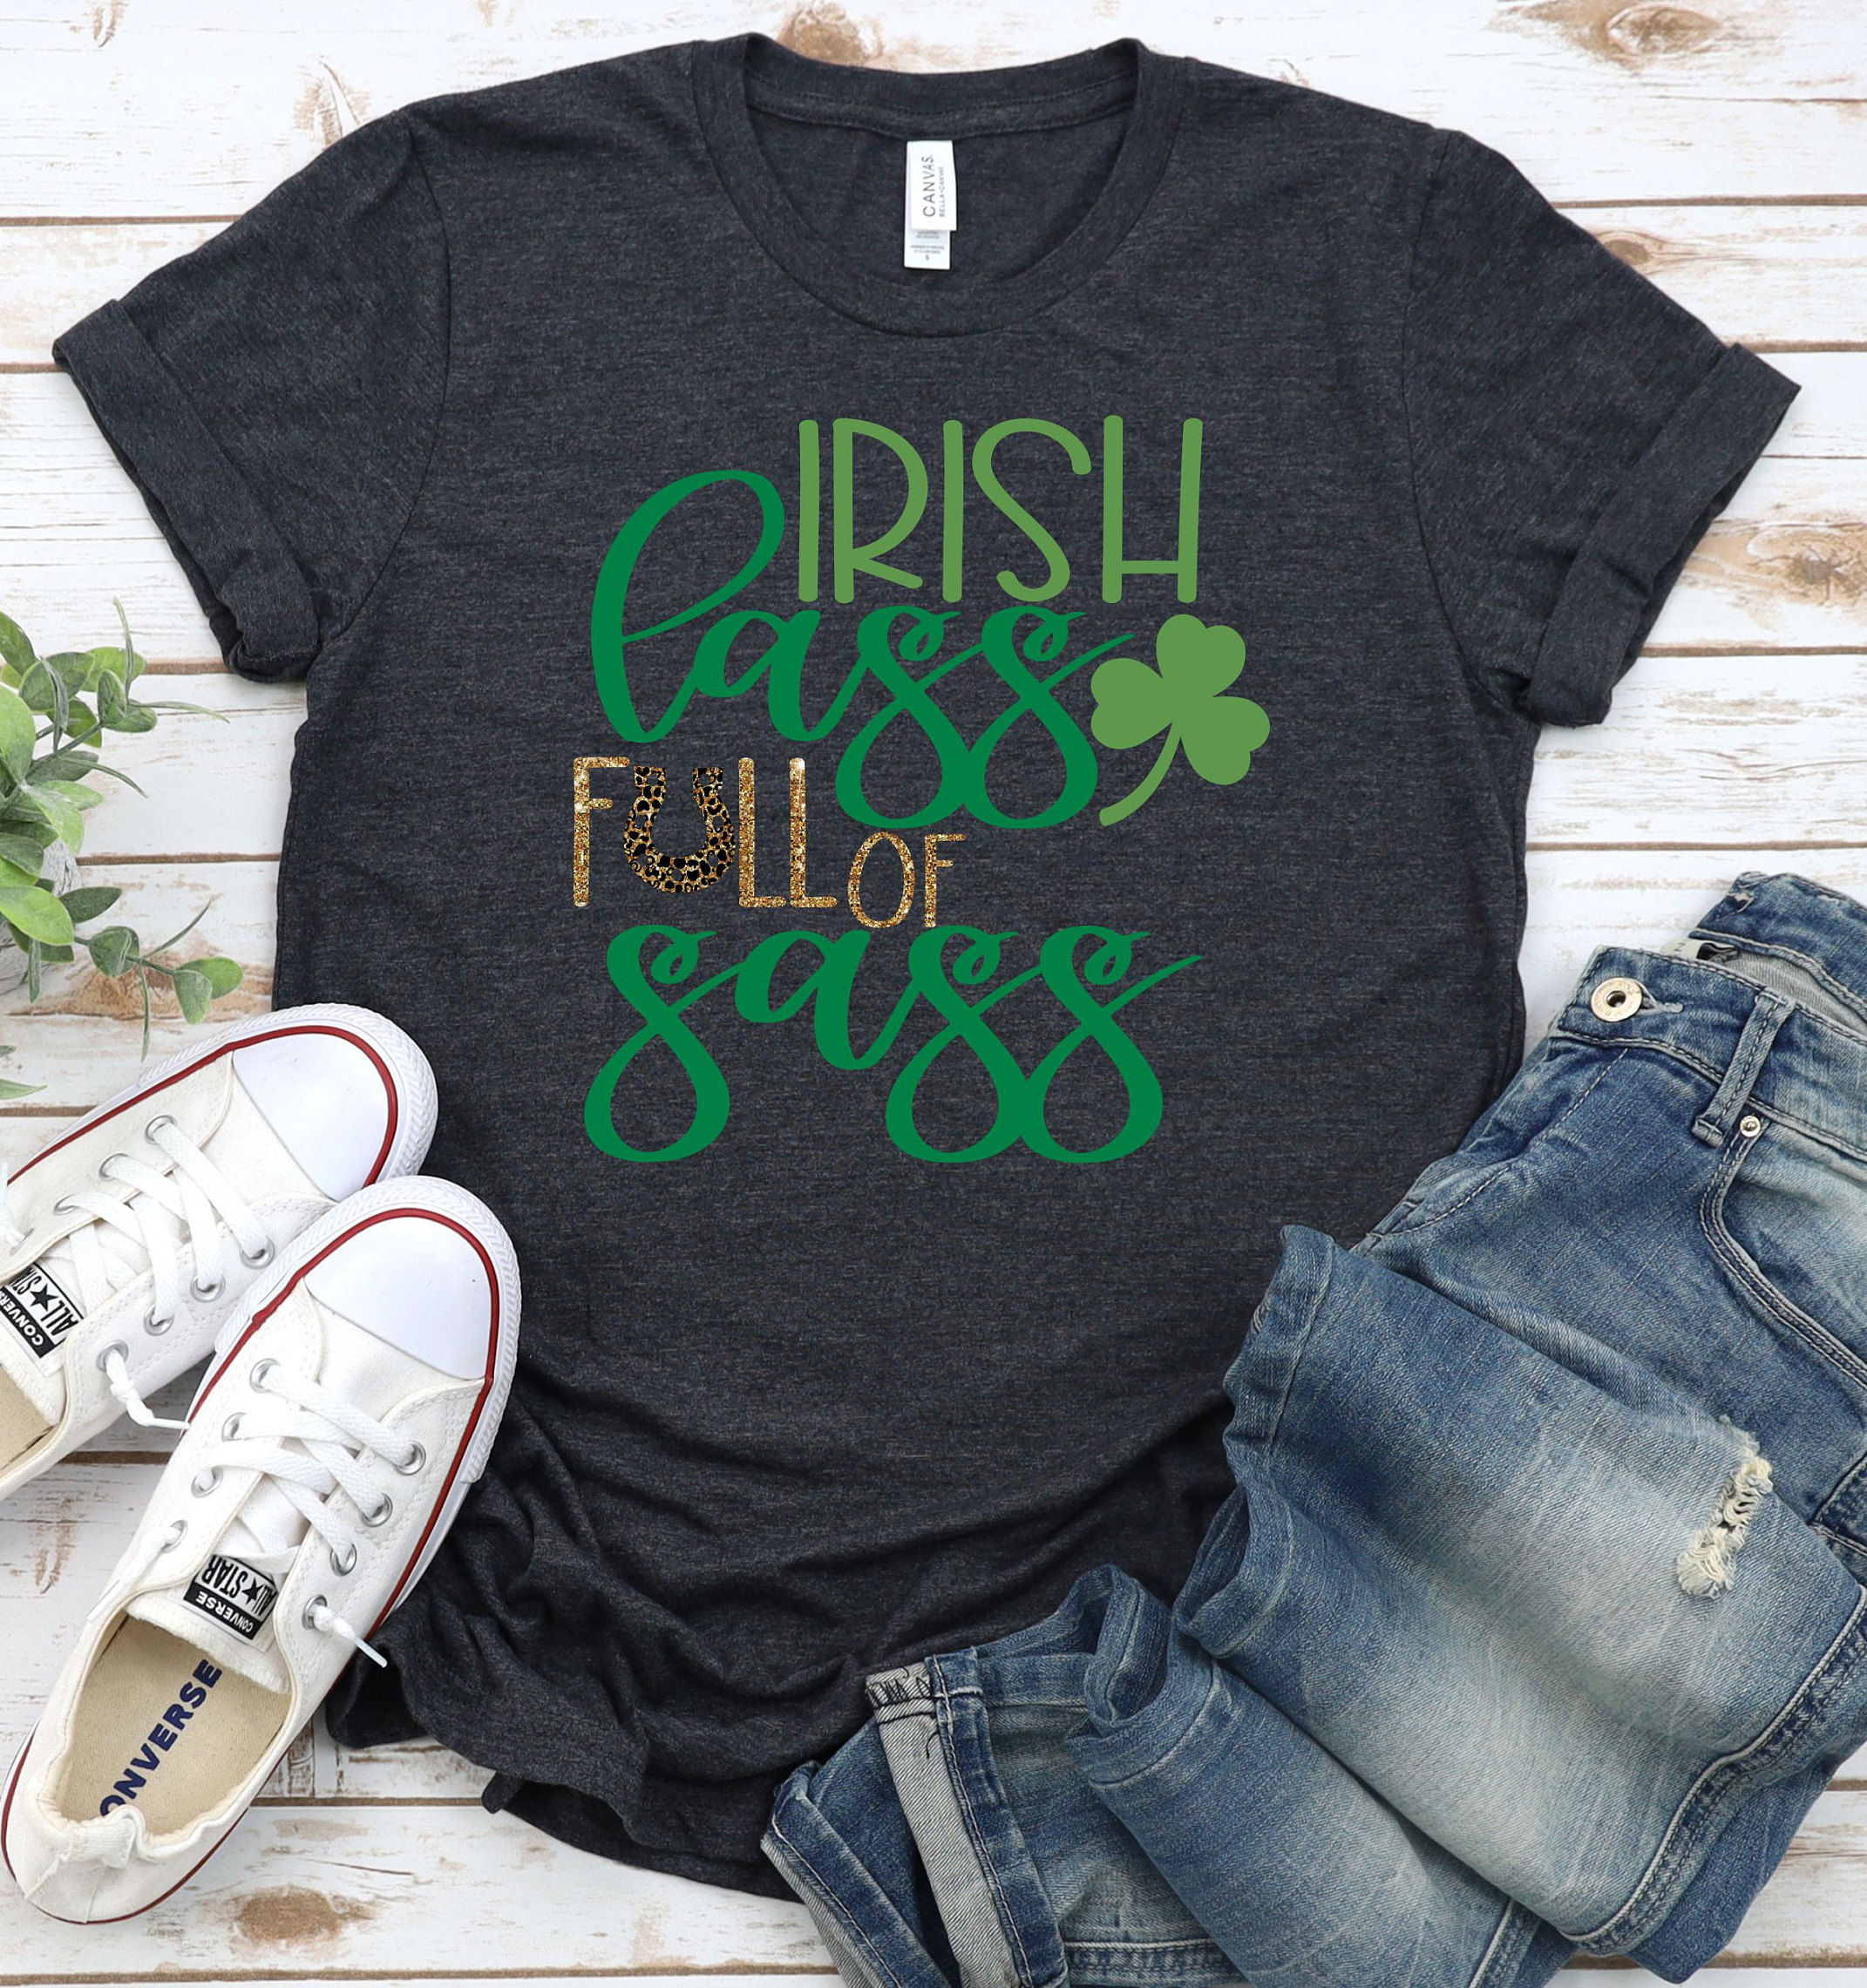 St-patricks-day-svg-irish-lass-full-of-sass-svg-irish-svg-shamrock-svg-st-patricks-day-svg-designst-patricks-day-cut-filecricut-svg-60513f41